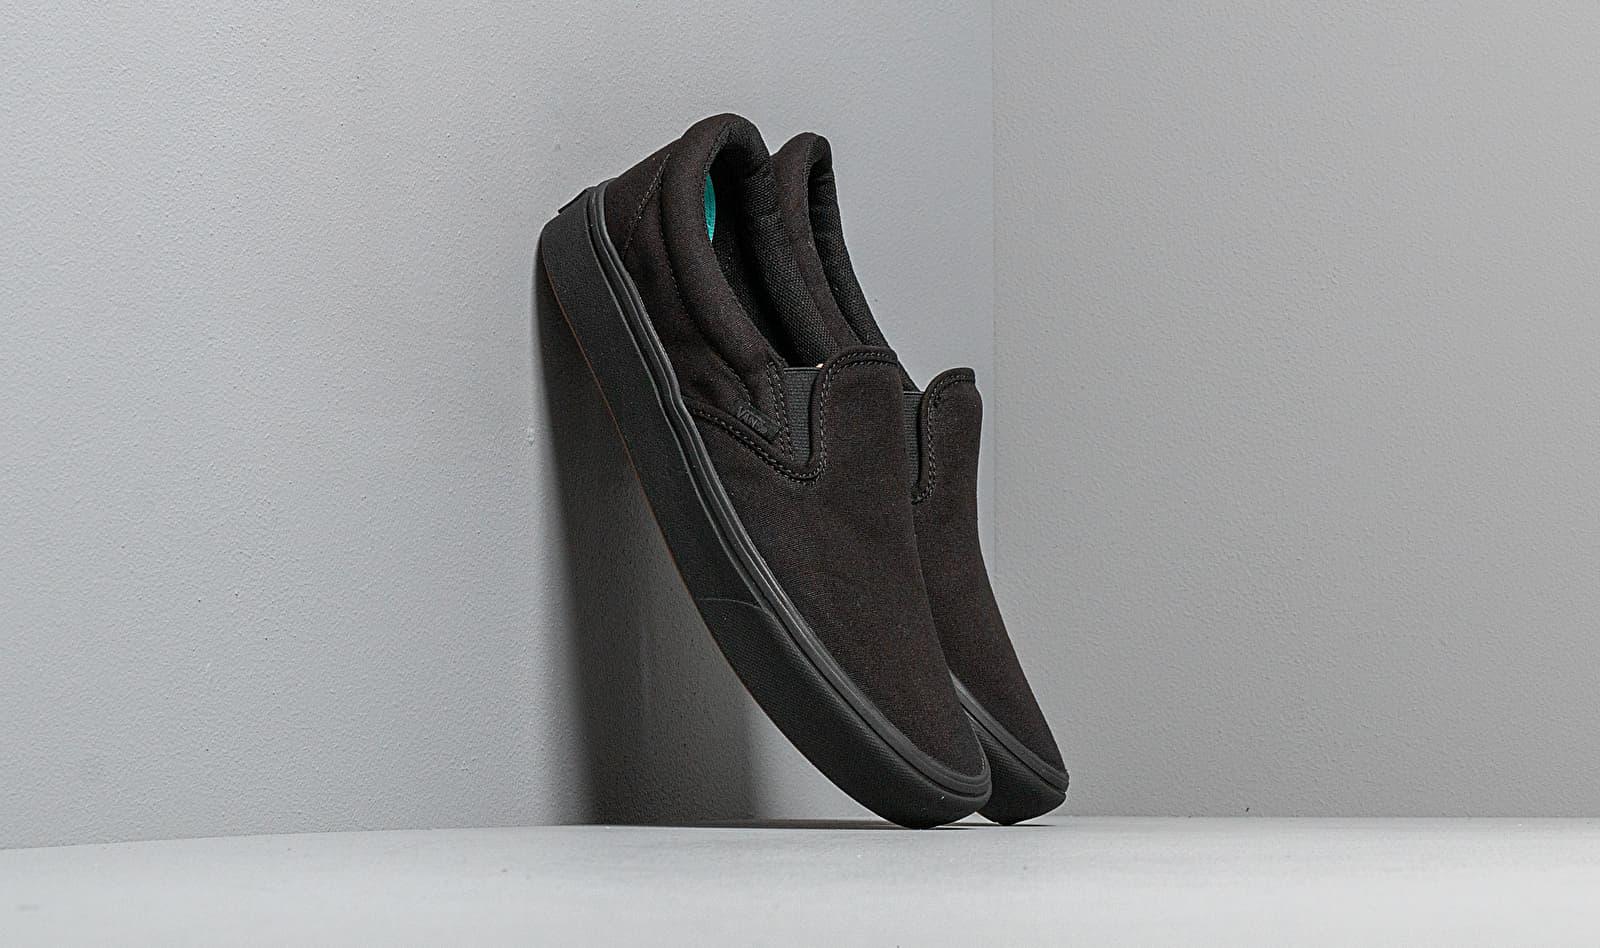 Vans ComfyCush Slip-On (Classic) Black/ Black VN0A3WMDVND1